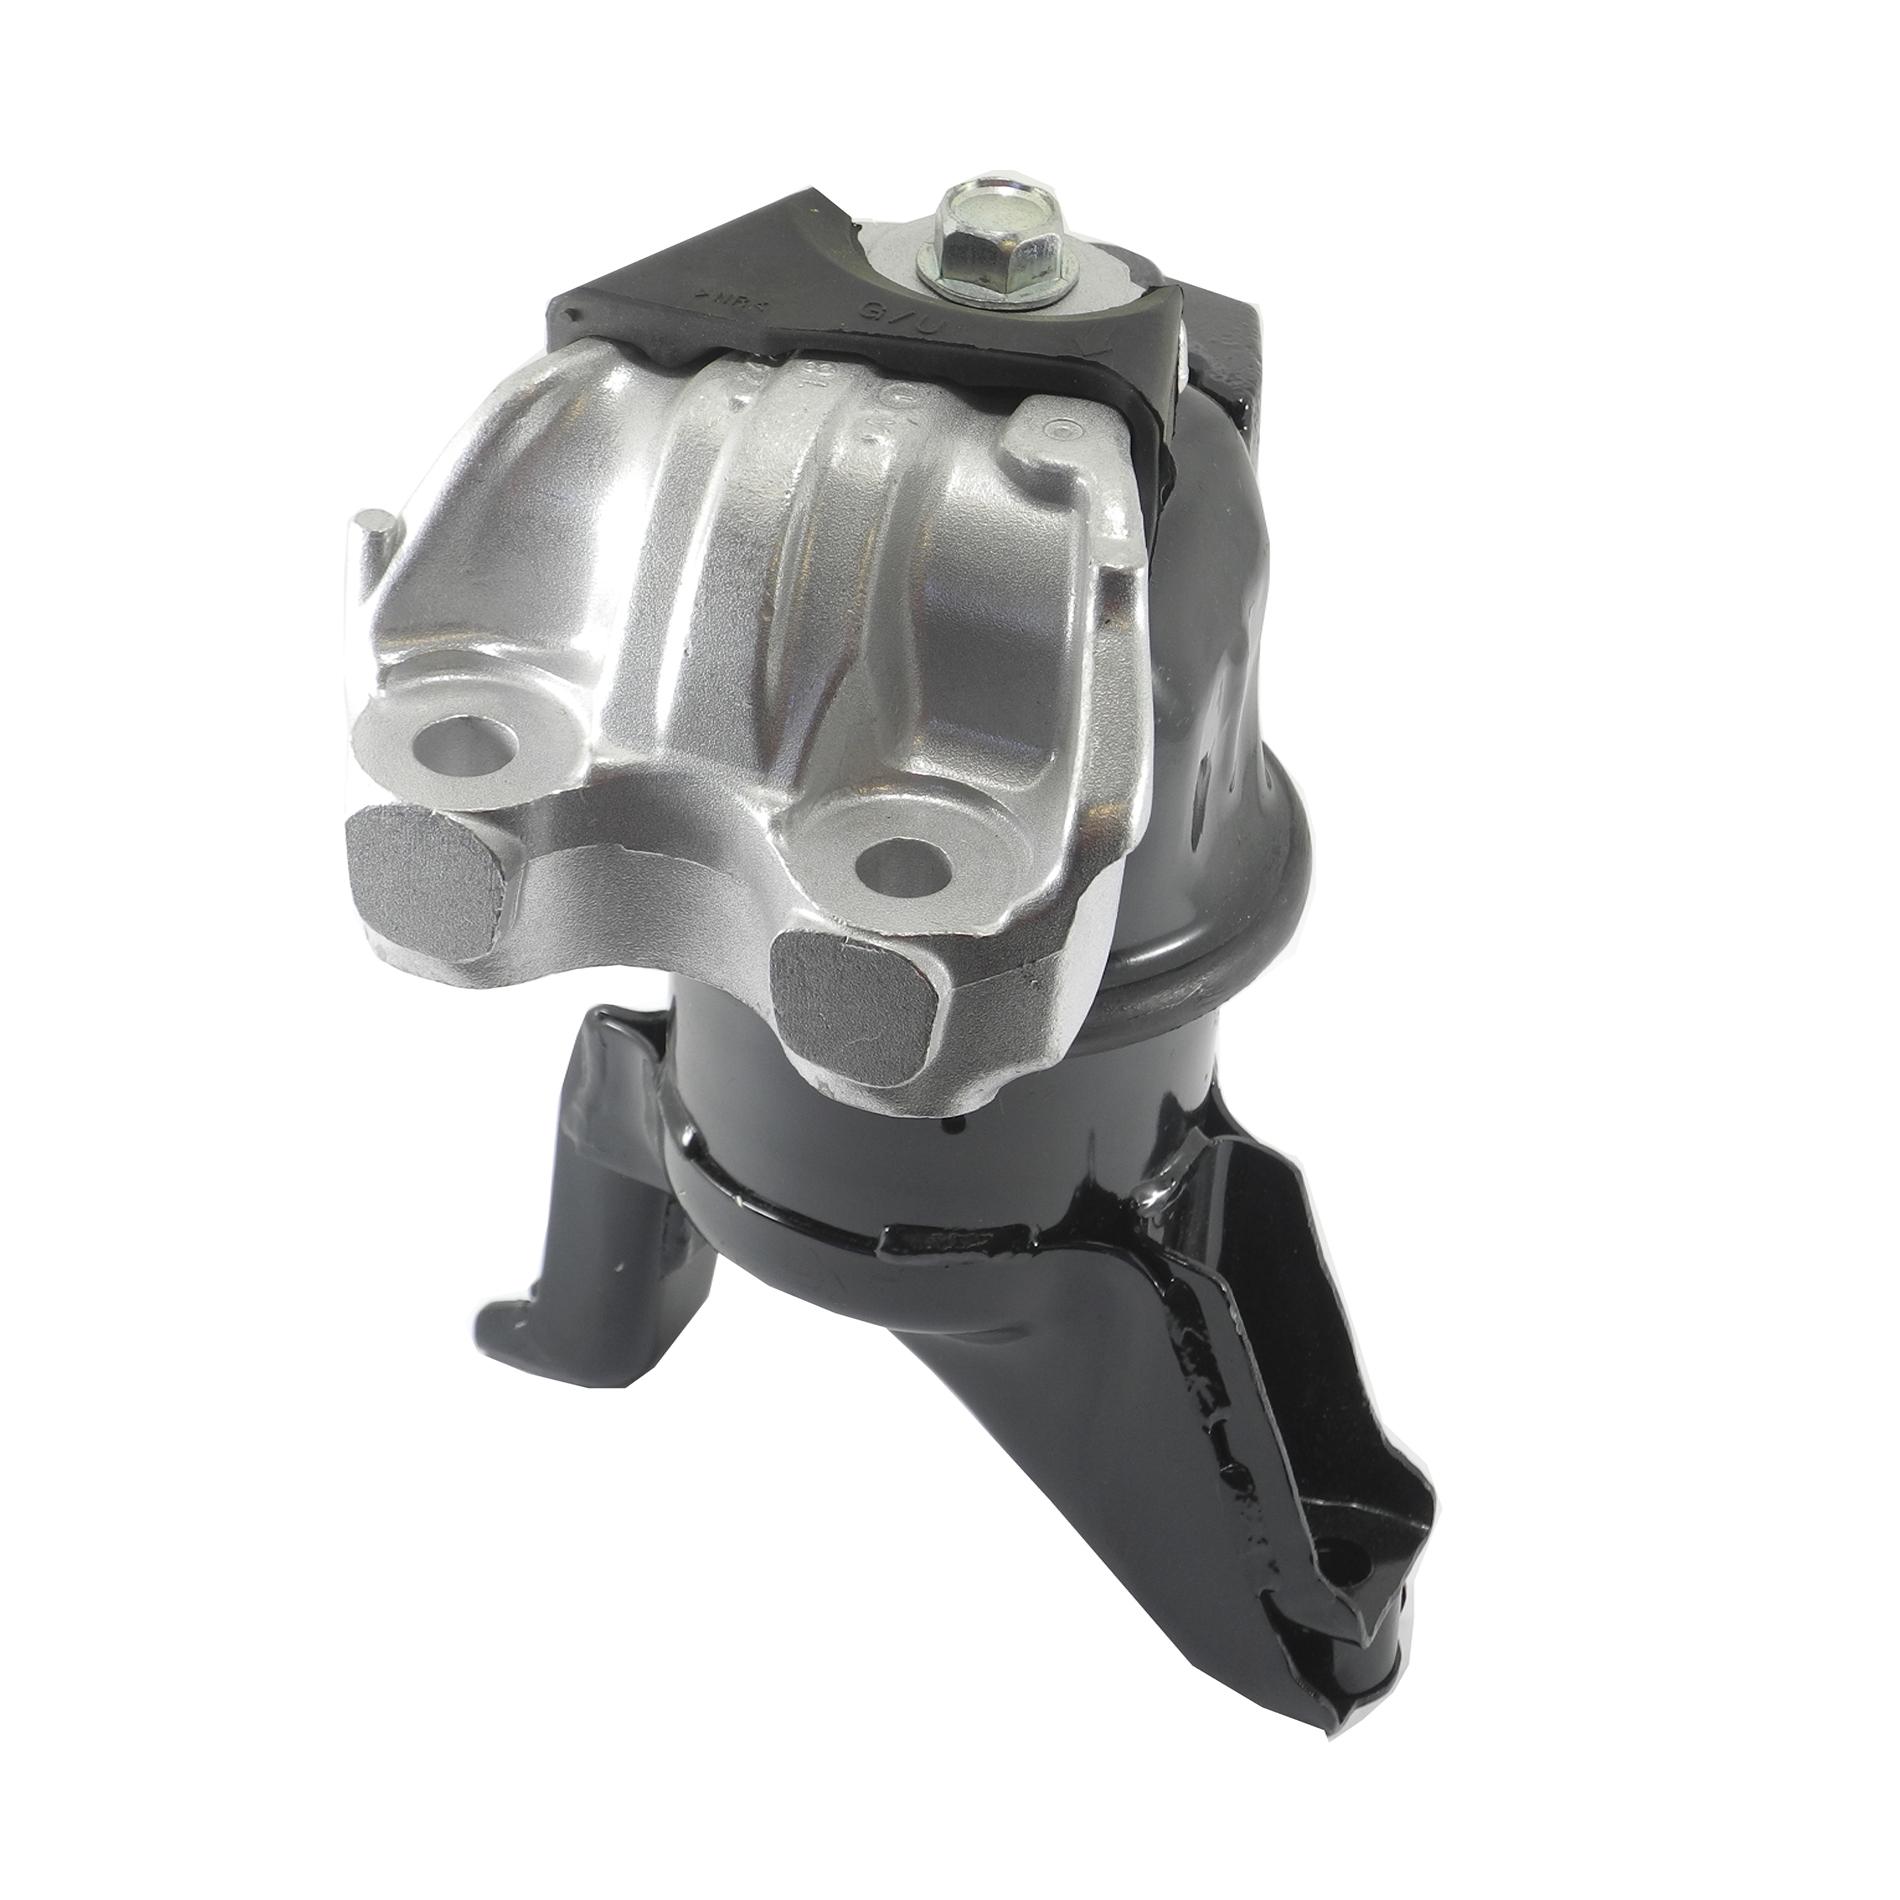 For Honda Civic 2012 1.8L Engine Motor /& Trans Mount MK024 65021 MK073 3PCS